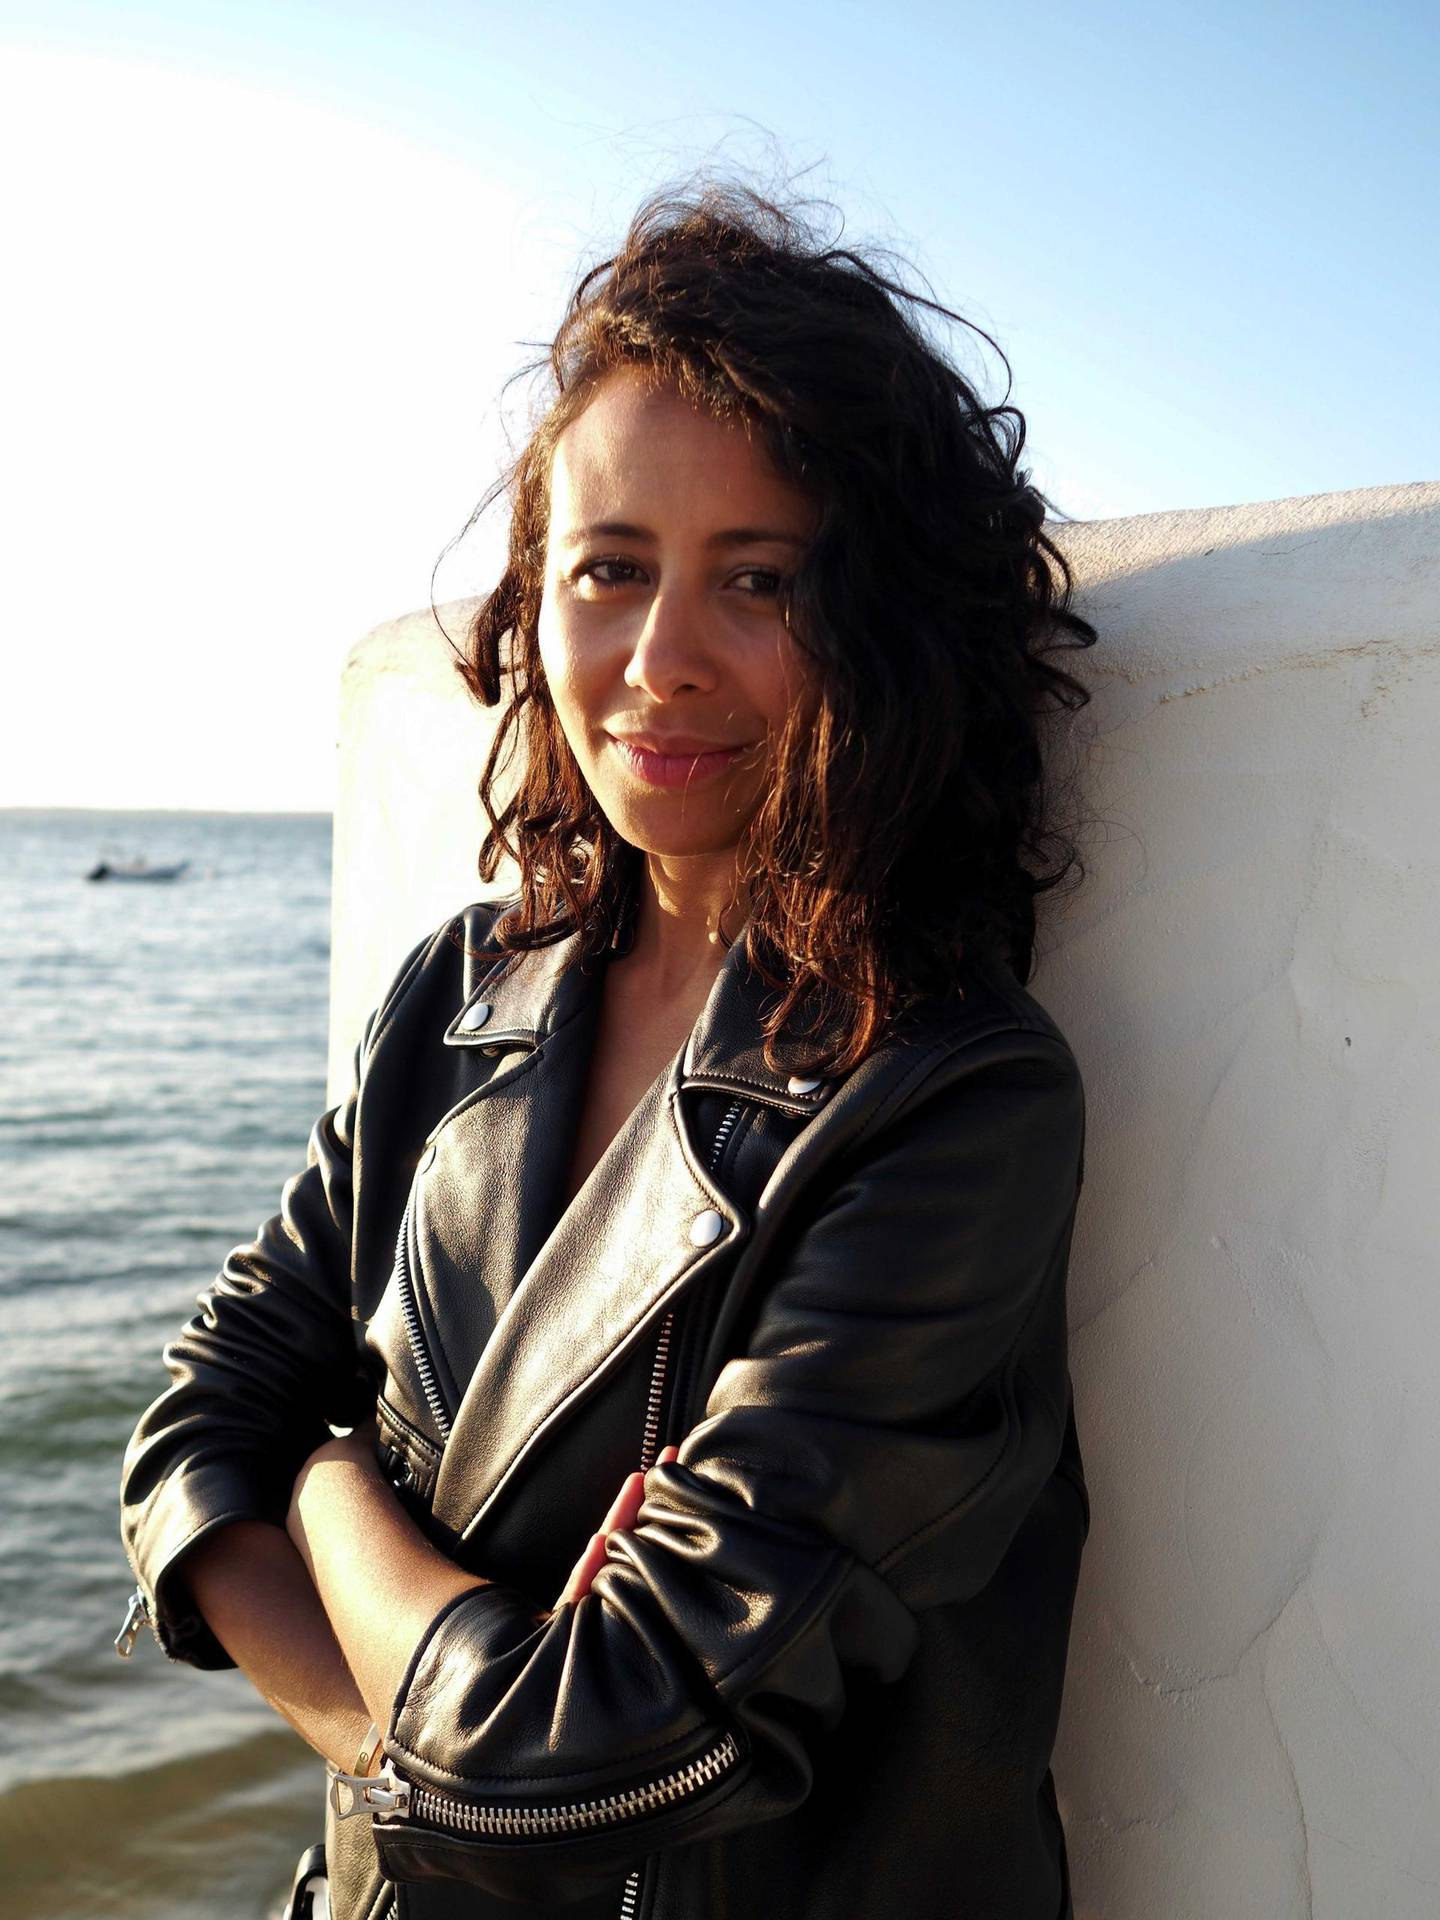 French-Tunisian writer-director Manele Labidi. Photo by Carole Bethuel